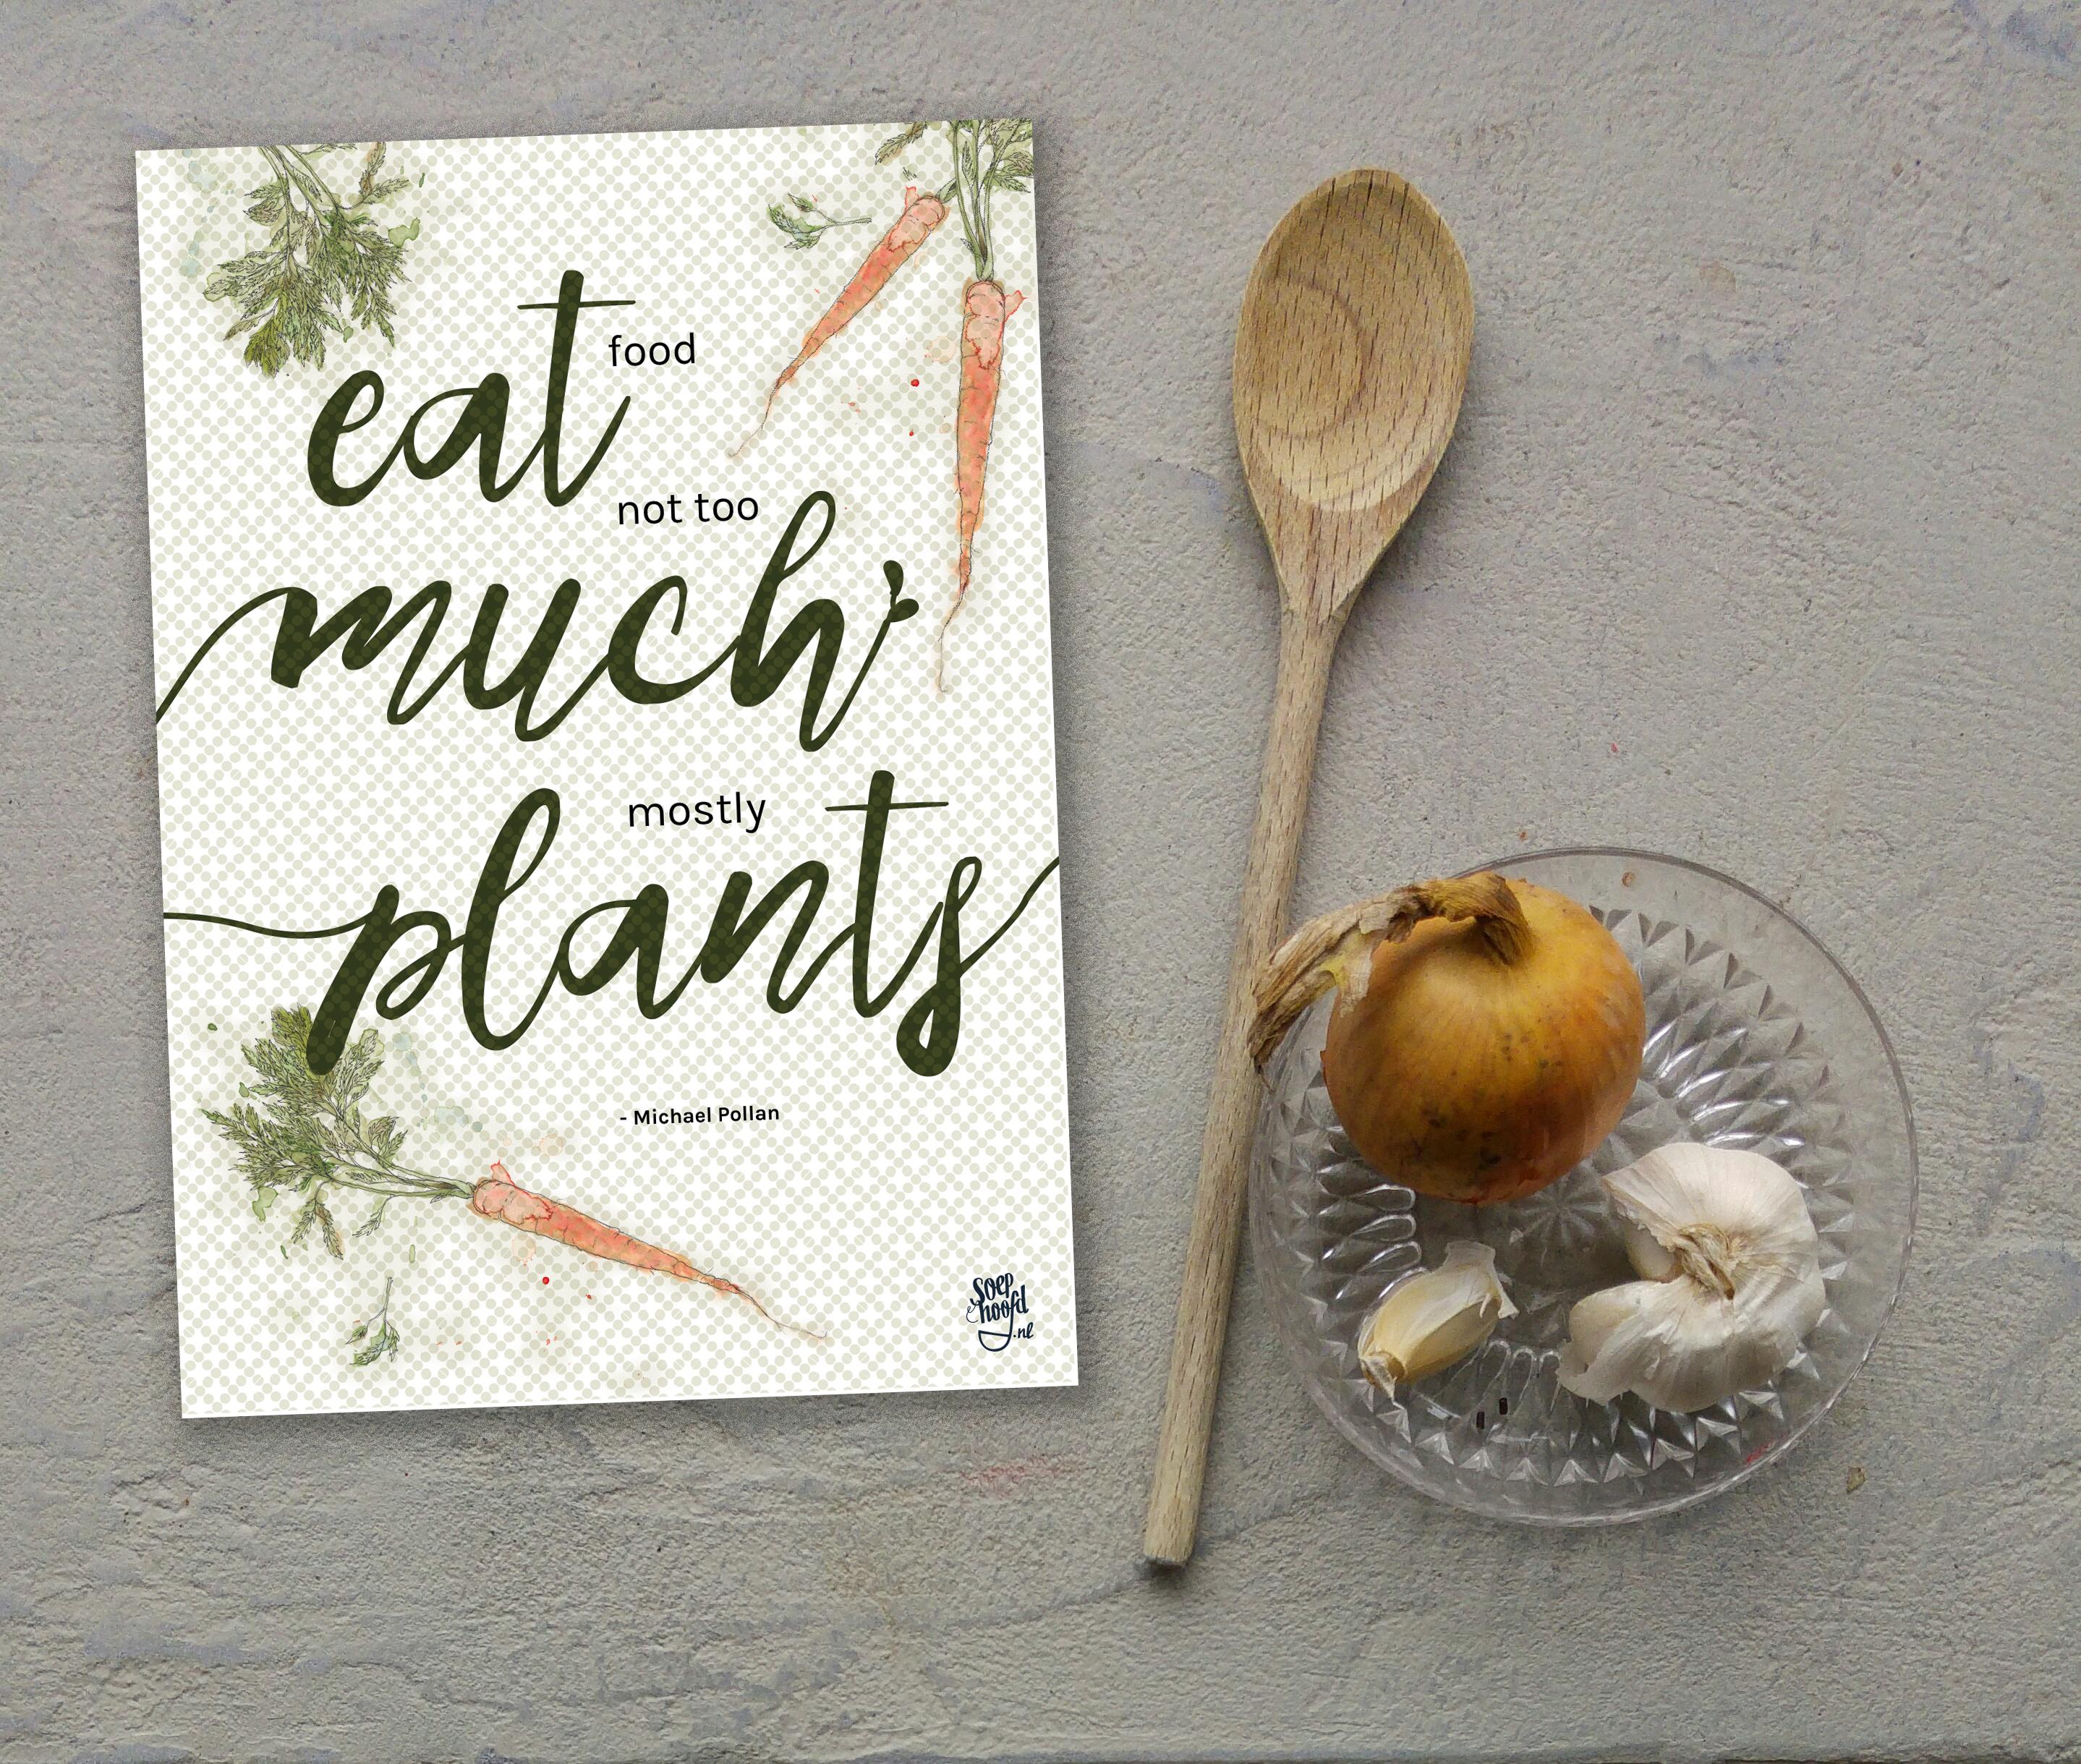 printable-kitchen-quote-michael-pollan